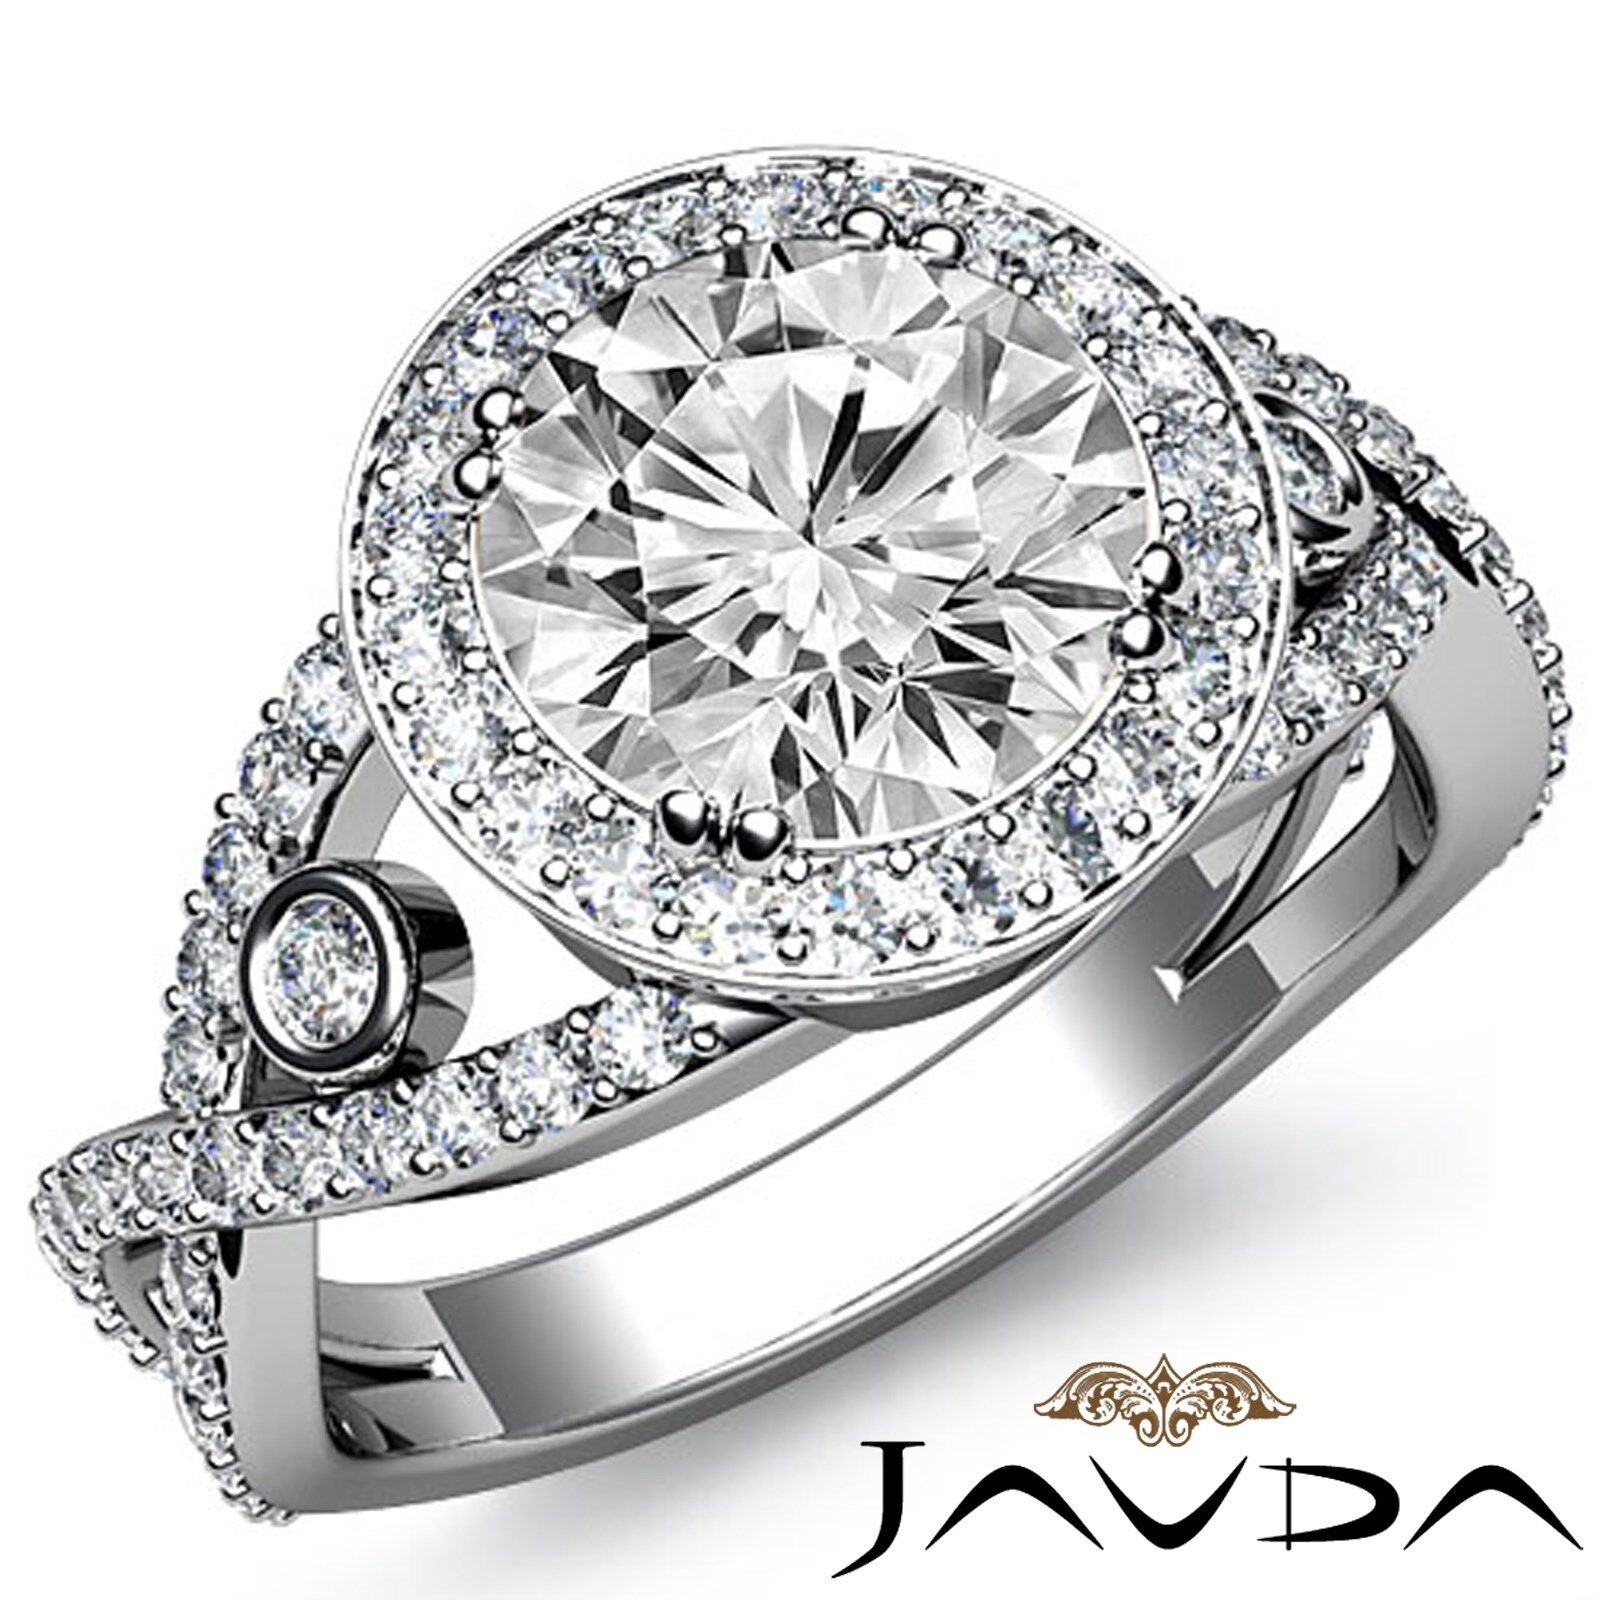 Bezel Set Cross Shank Halo Round Diamond Engagement Ring GIA I Color VS2 2.9Ct